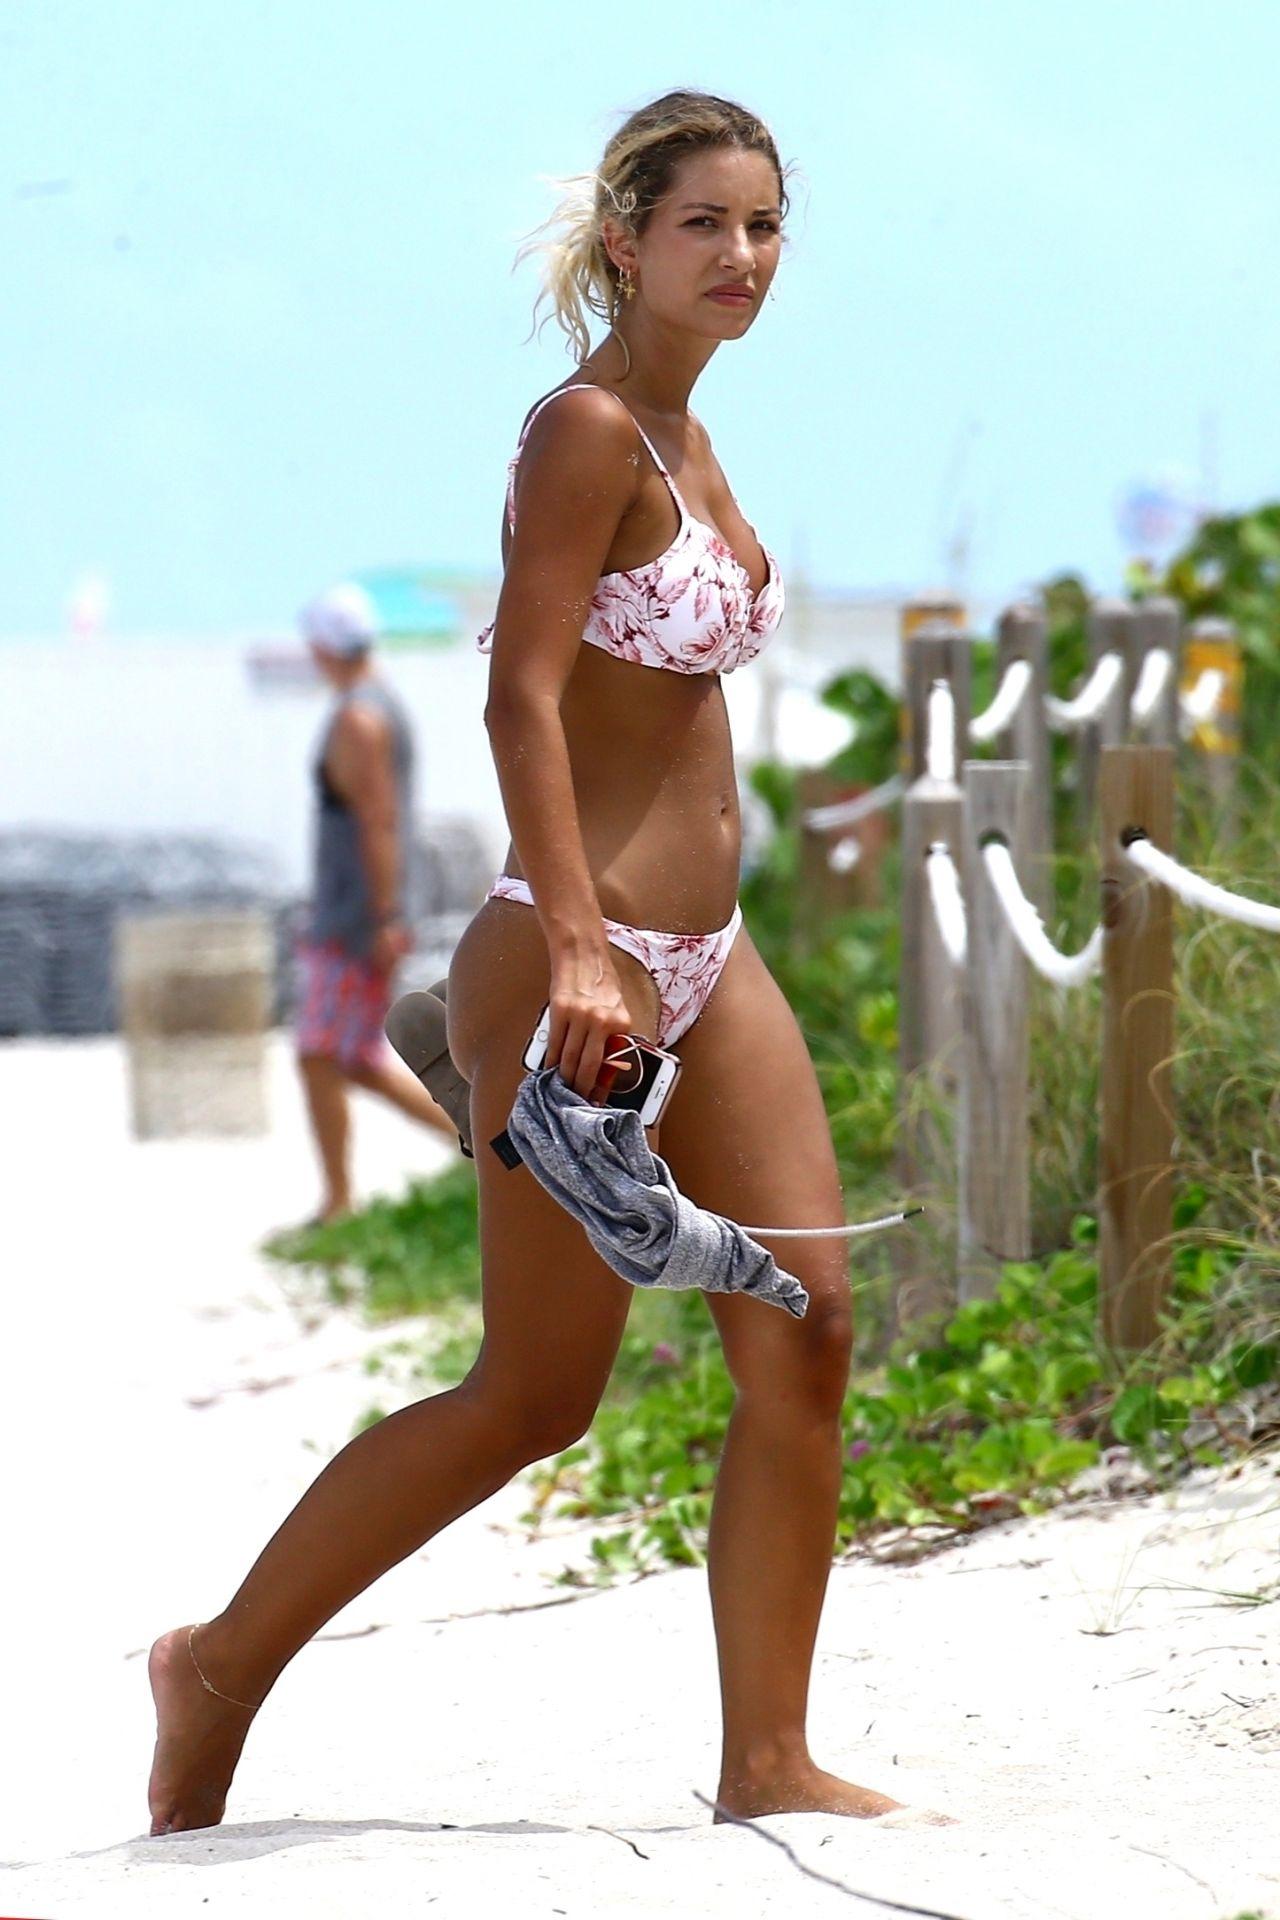 Sierra Skye In A Bikini Beach In Miami 07 19 2017